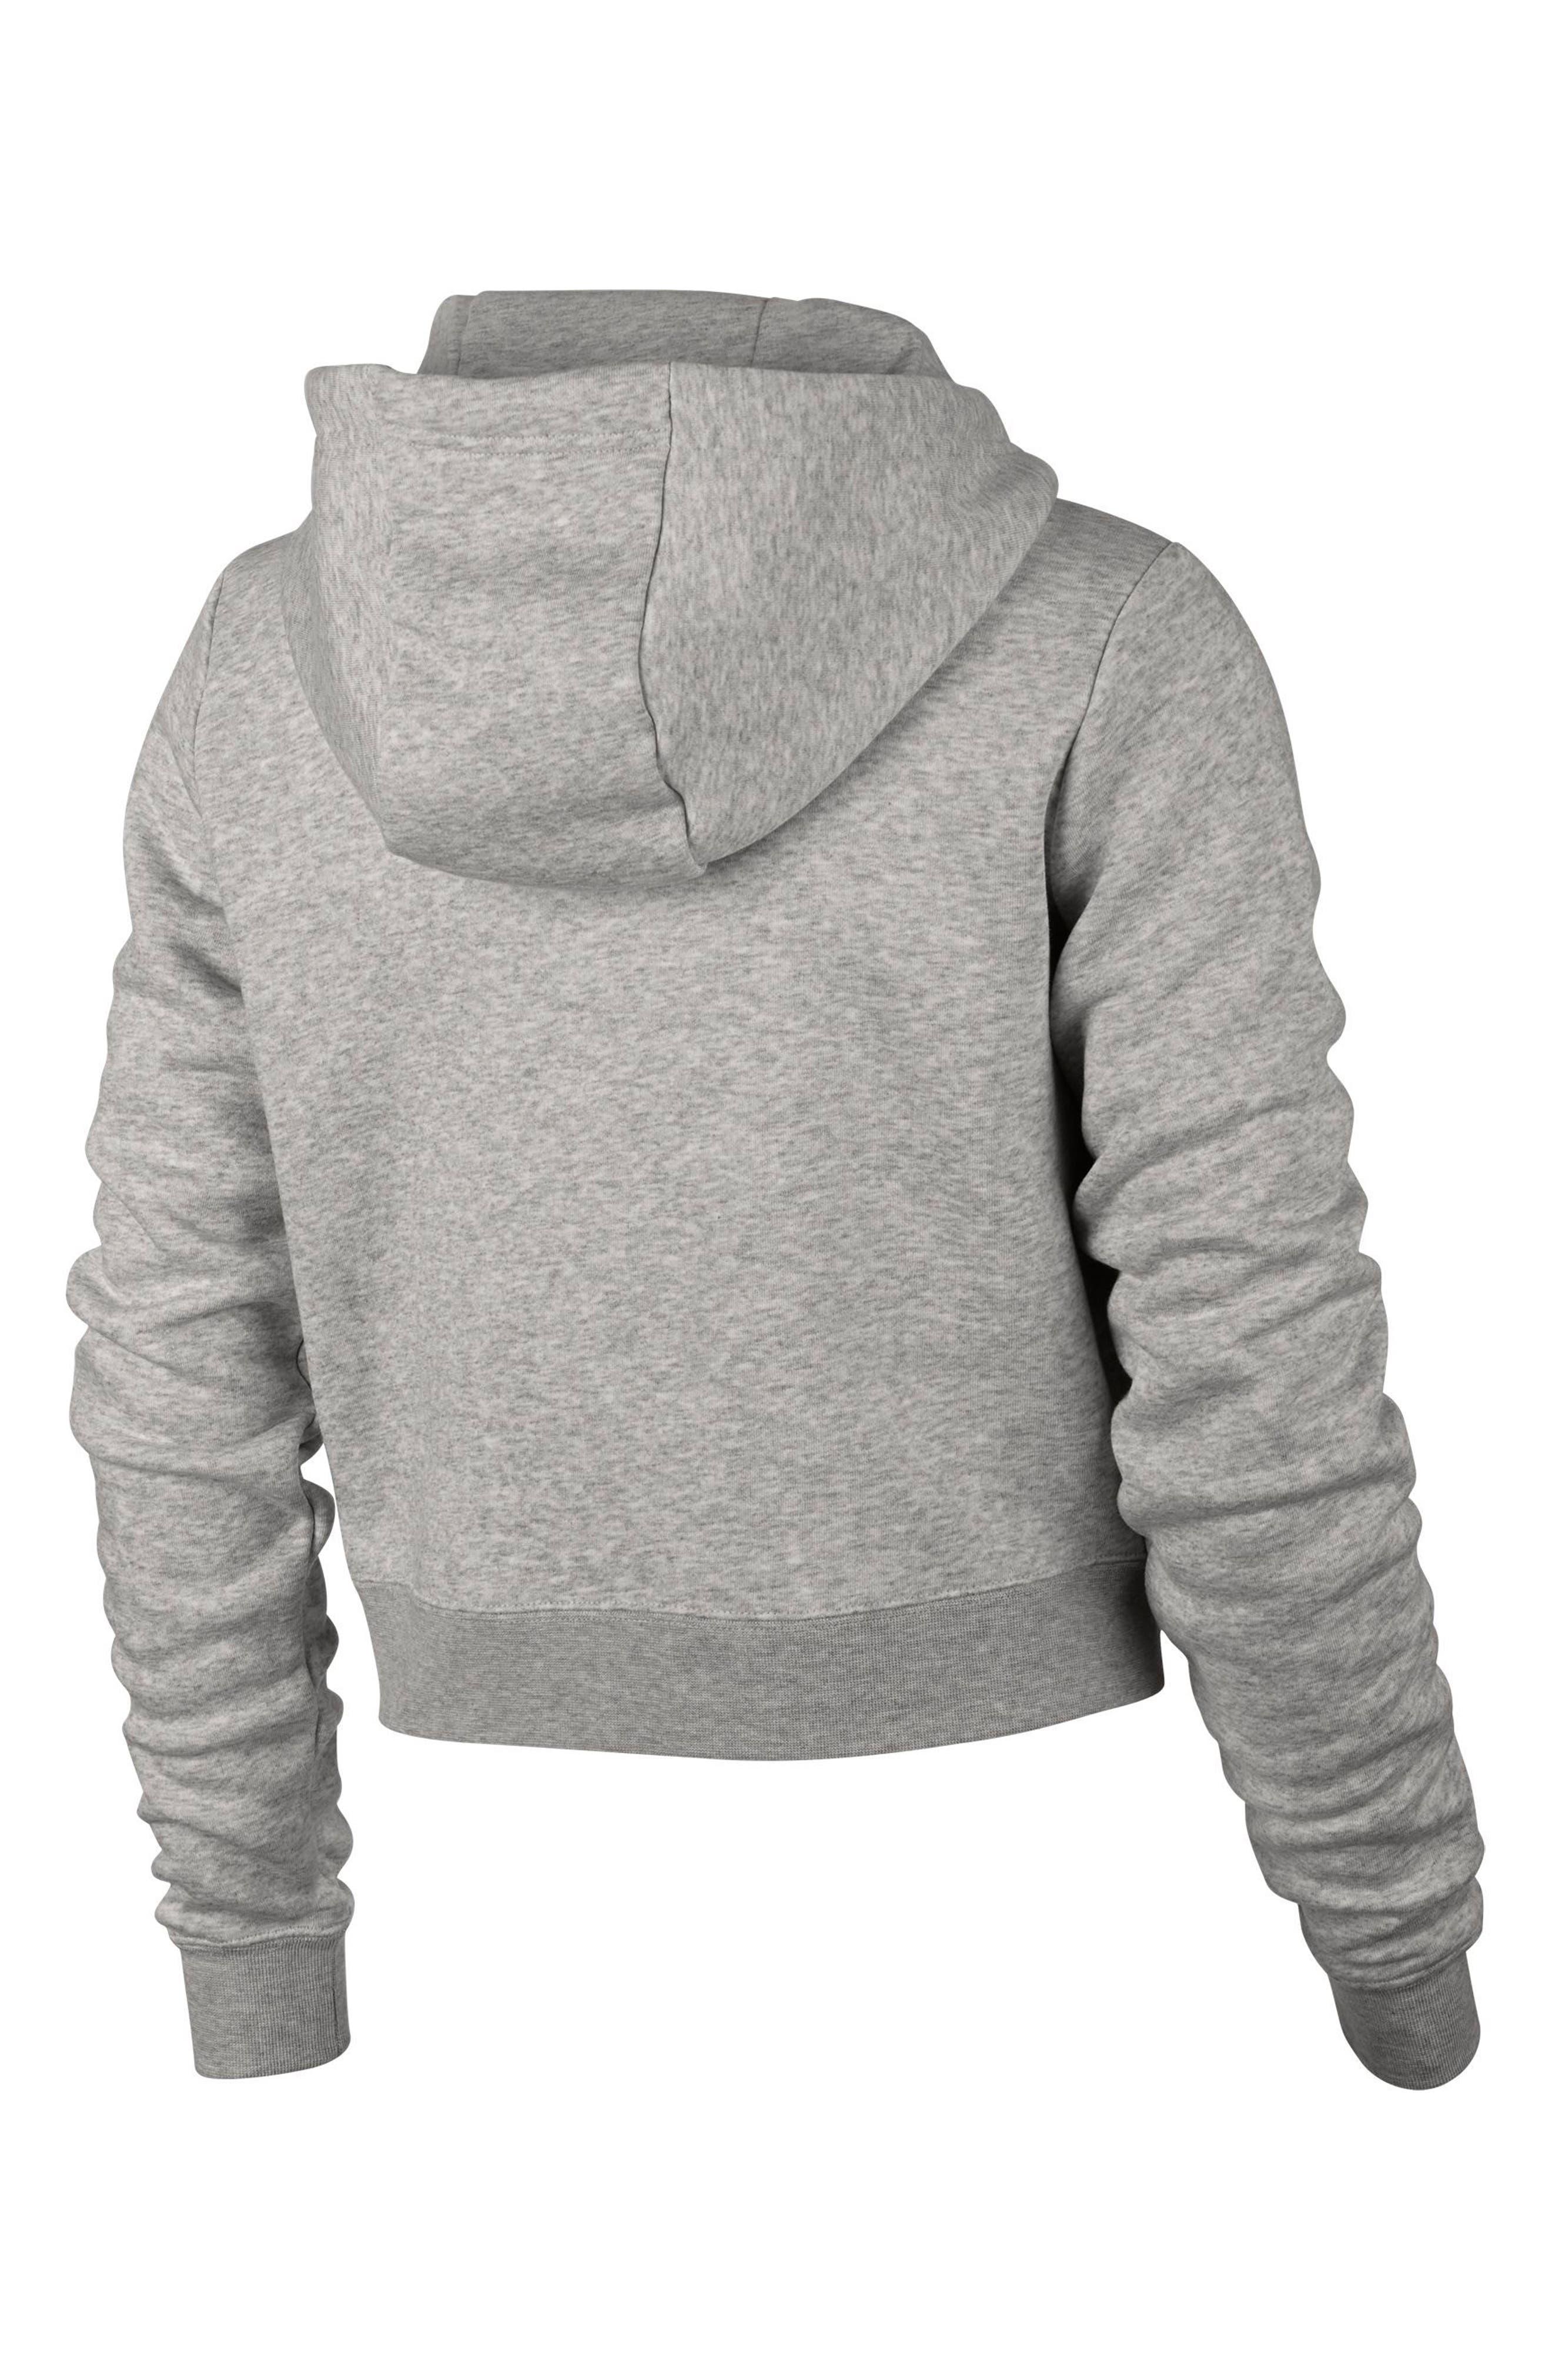 Sportswear Rally Crop Hoodie,                             Alternate thumbnail 2, color,                             GREY HEATHER/ PALE GREY/ WHITE